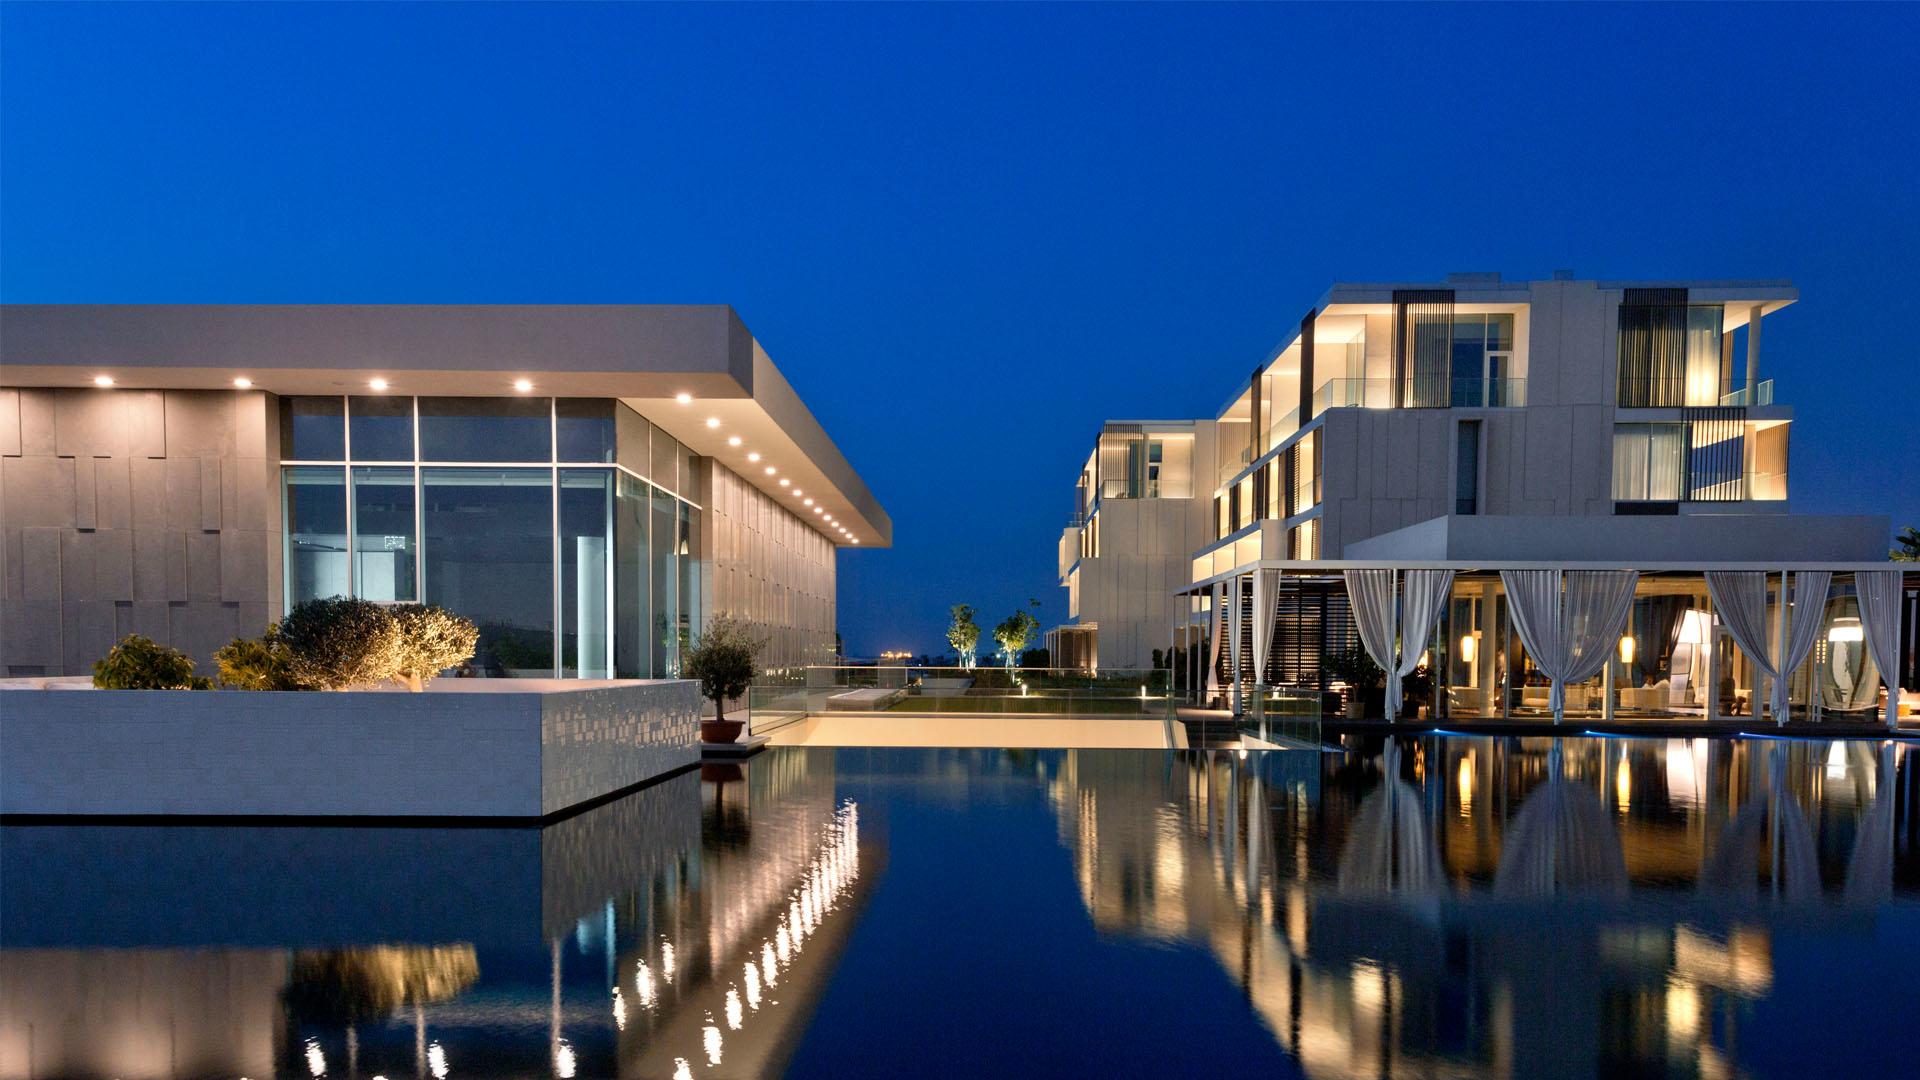 Review: A Pristine Weekend Retreat at The Oberoi Beach Resort, Al Zorah